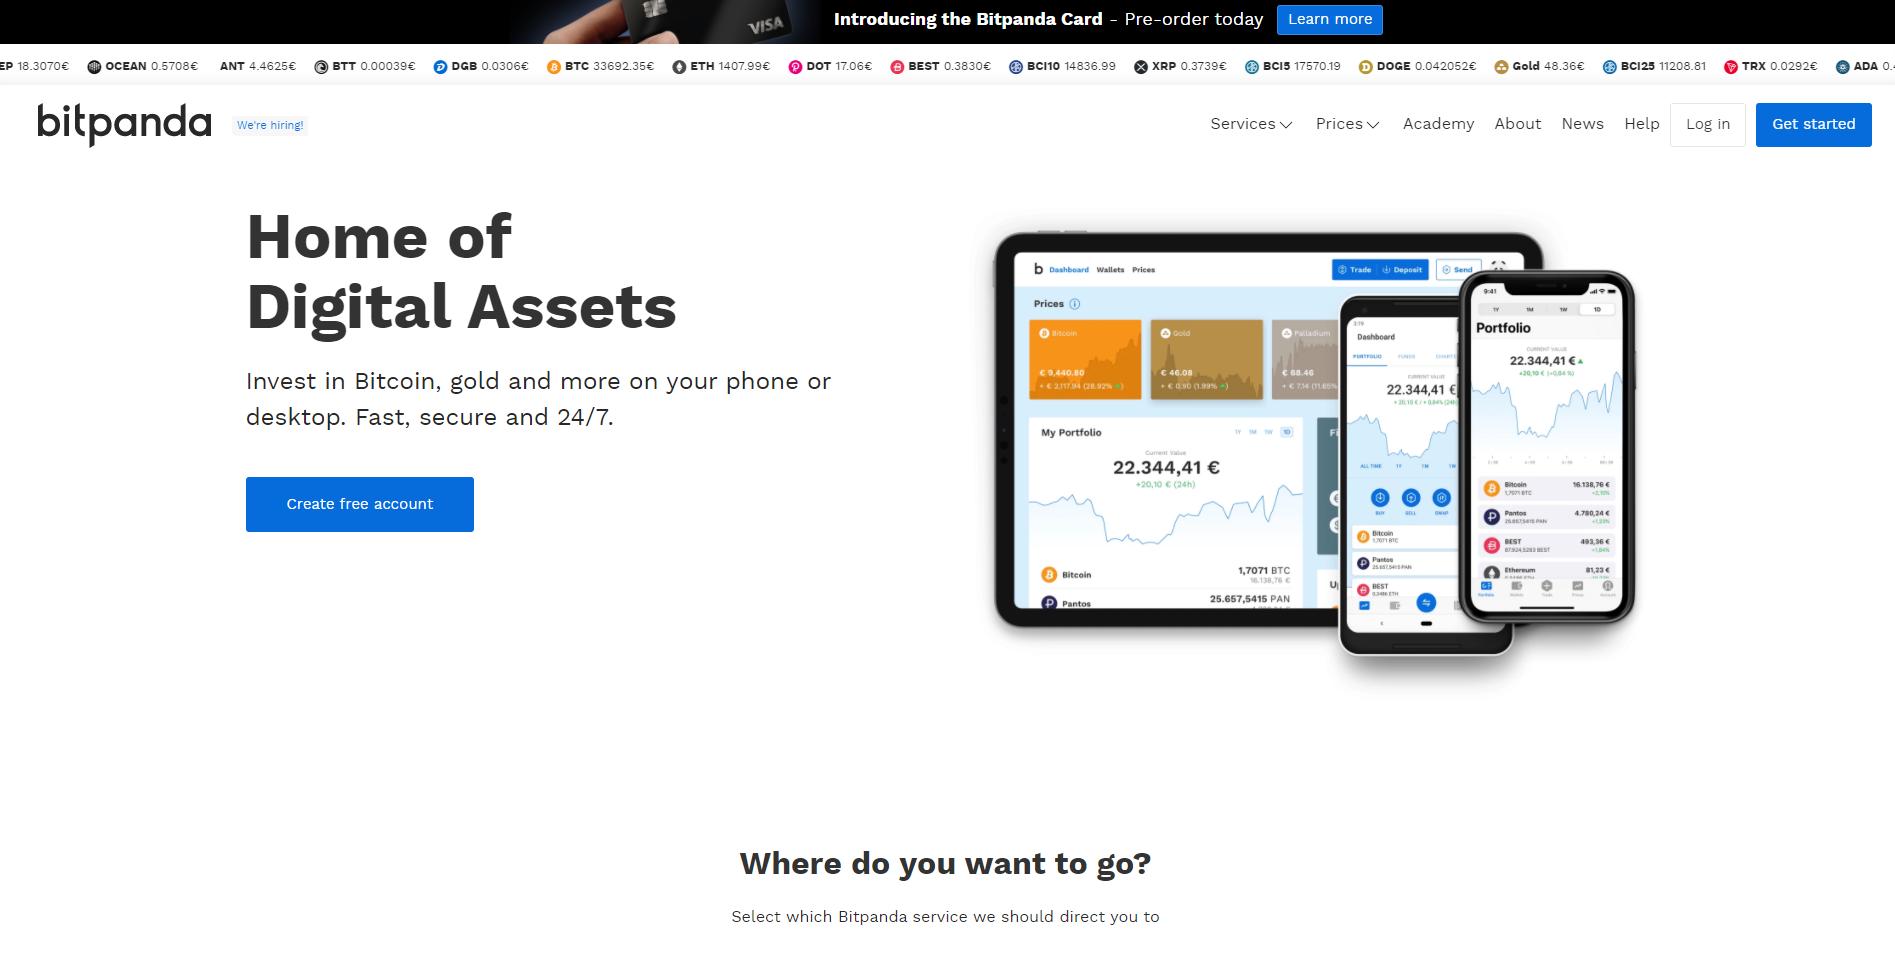 Official website of Bitpanda